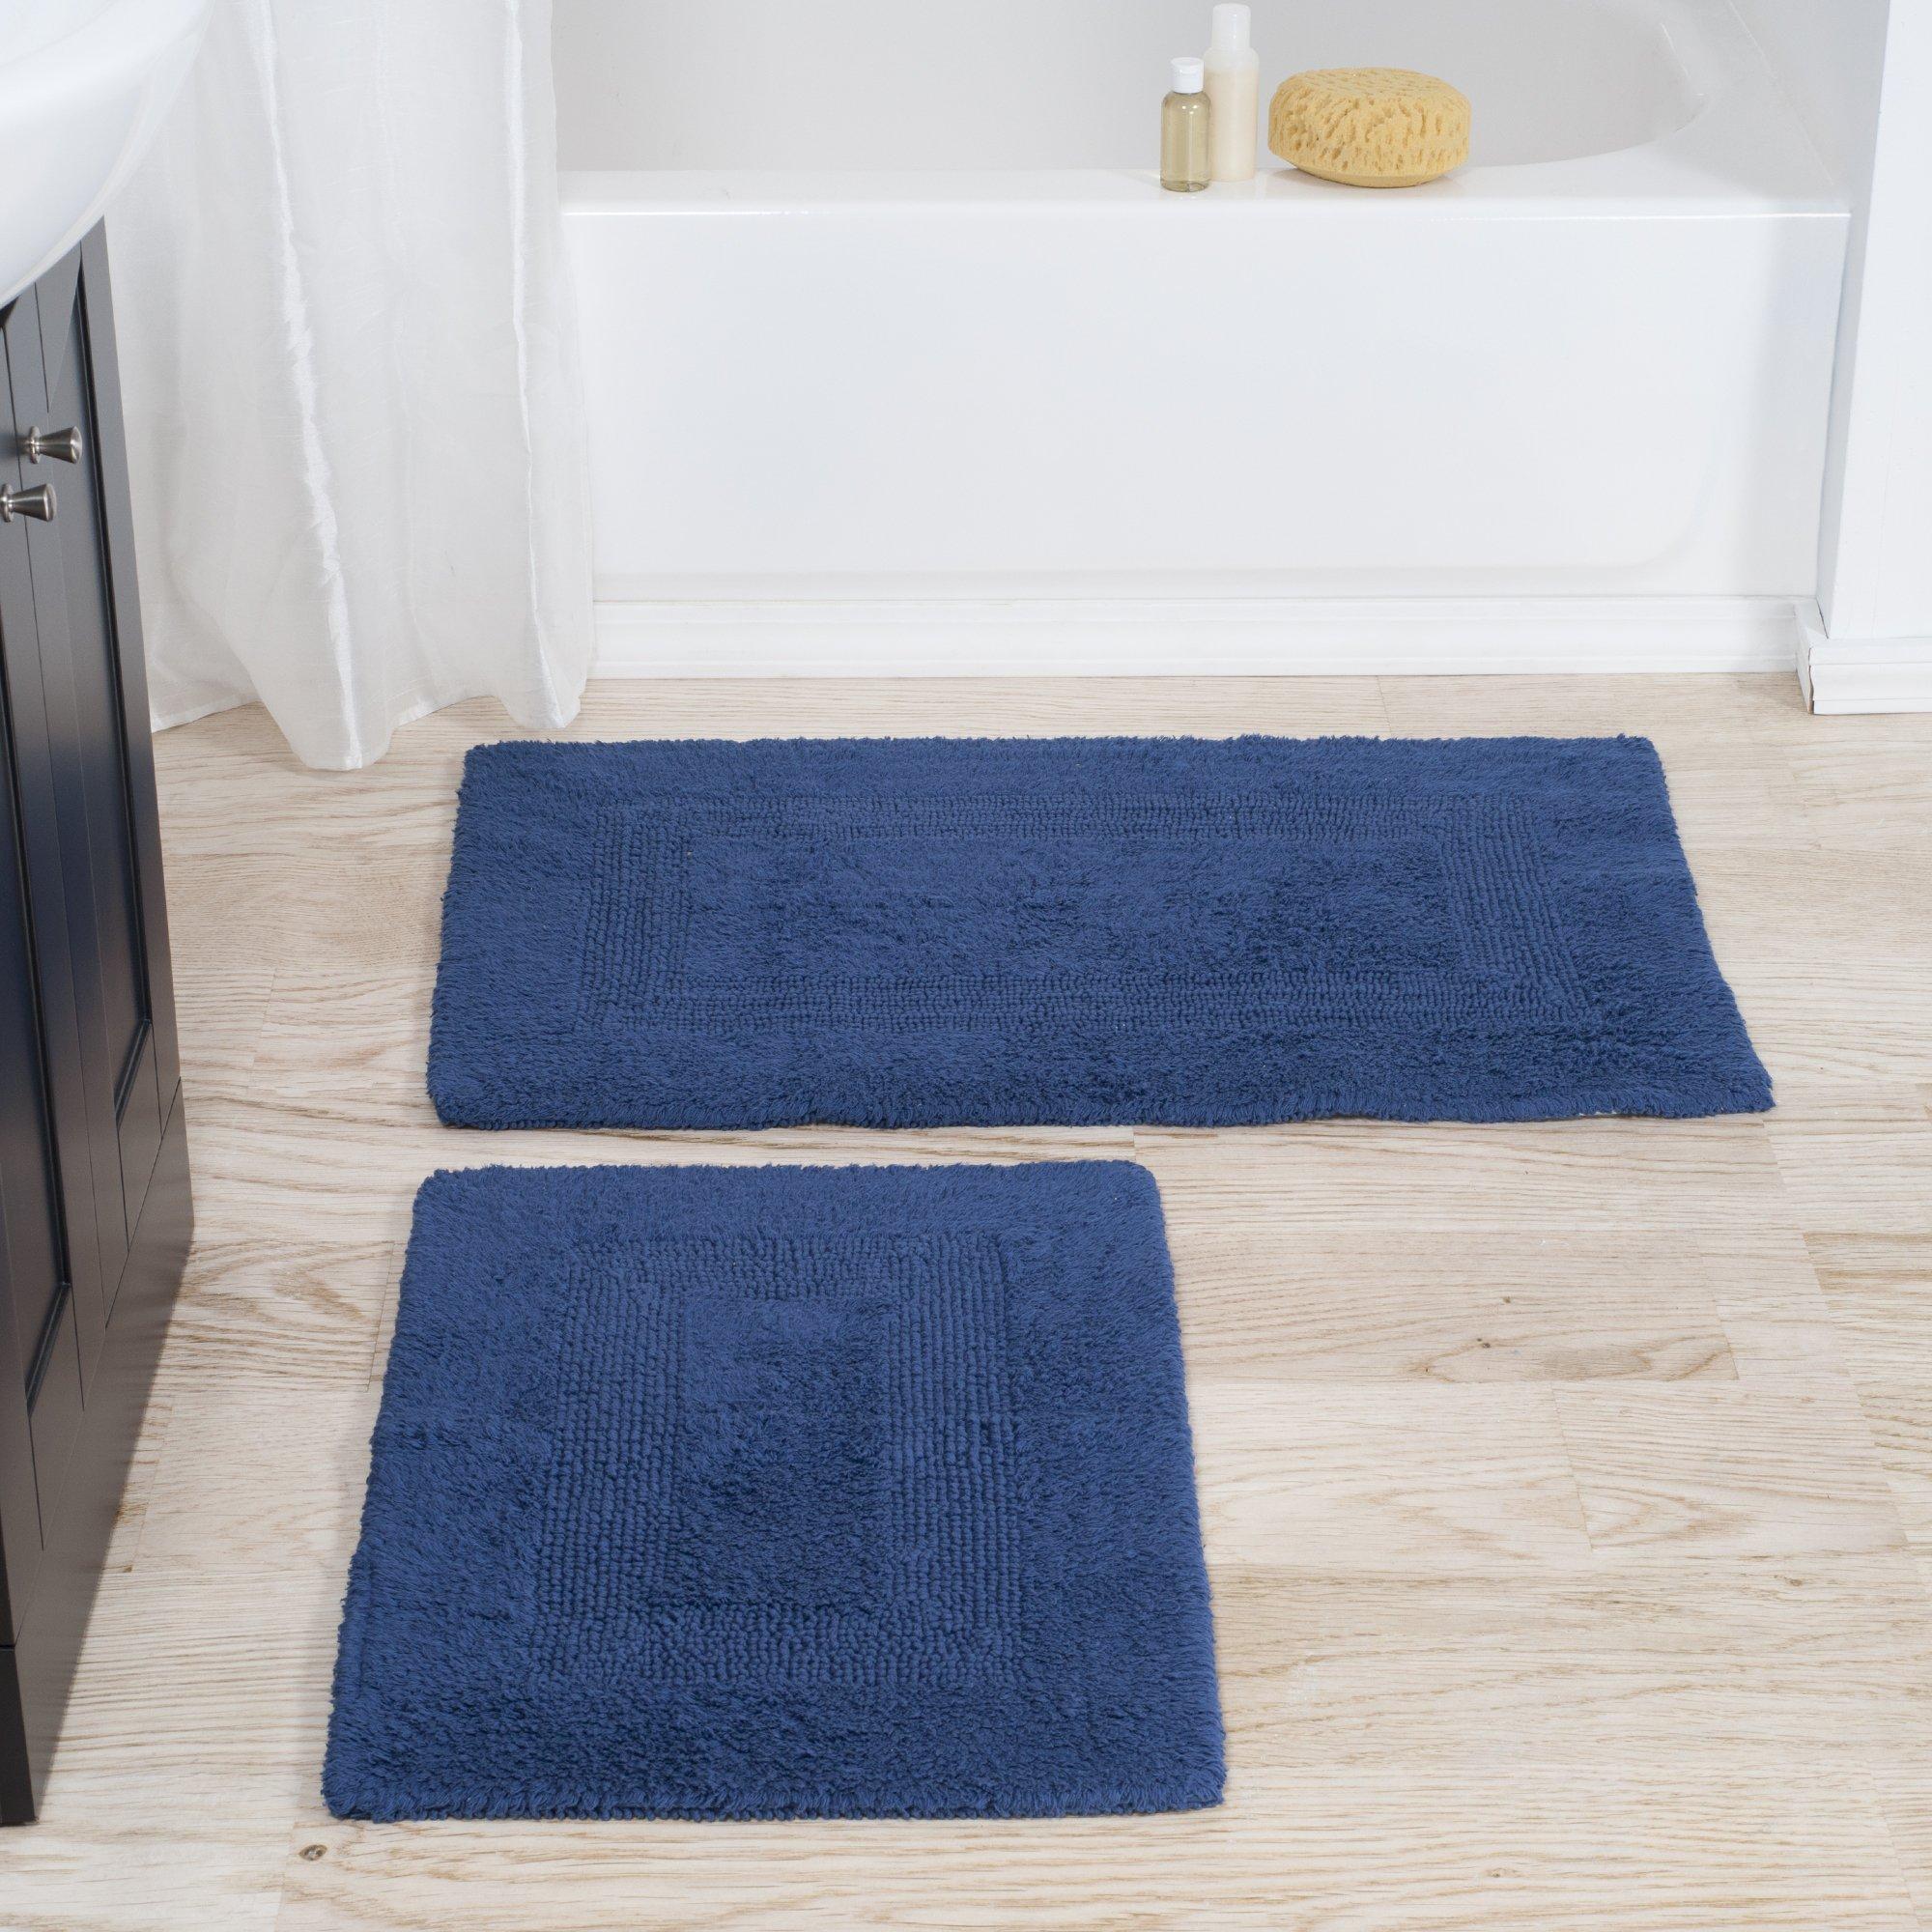 Lavish Home Cotton Bath Mat Set- 2 Piece 100 Percent Cotton Mats- Reversible, Soft, Absorbent and Machine Washable Bathroom Rugs By (Navy)